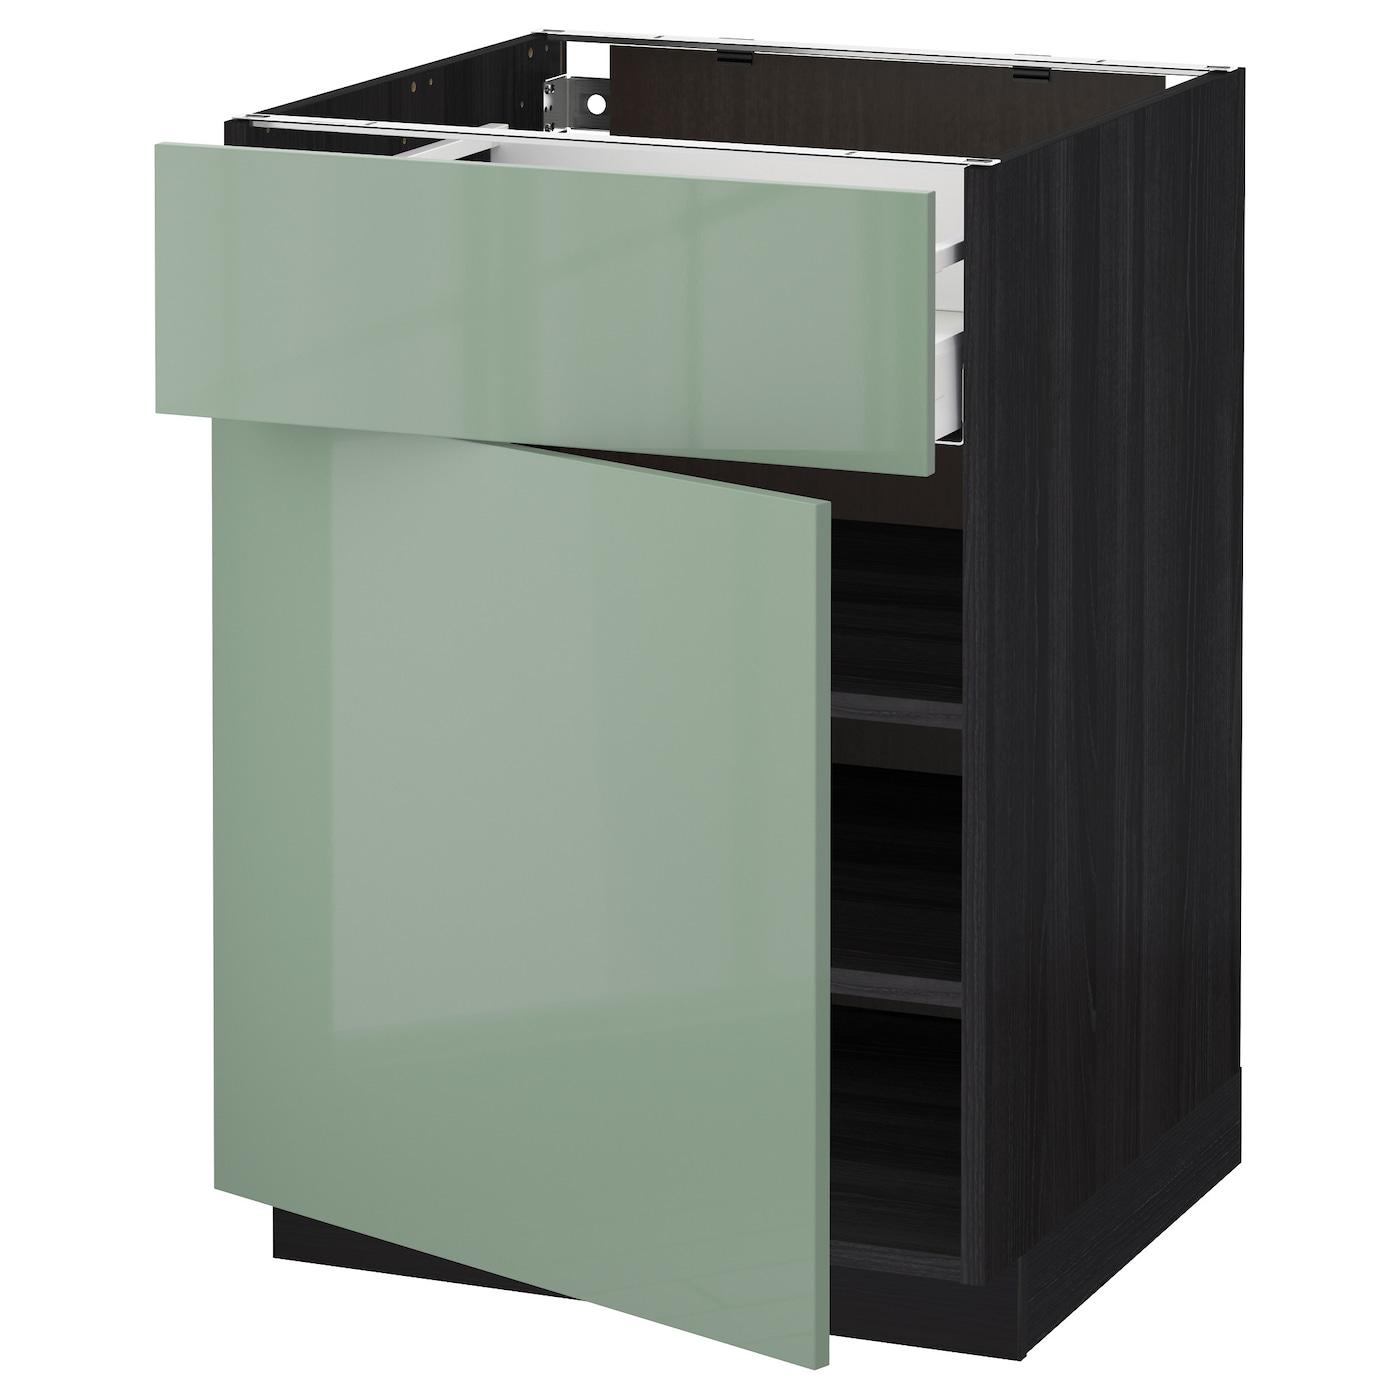 Ikea Green Kitchen Cabinets: METOD/MAXIMERA Base Cabinet With Drawer/door Black/kallarp